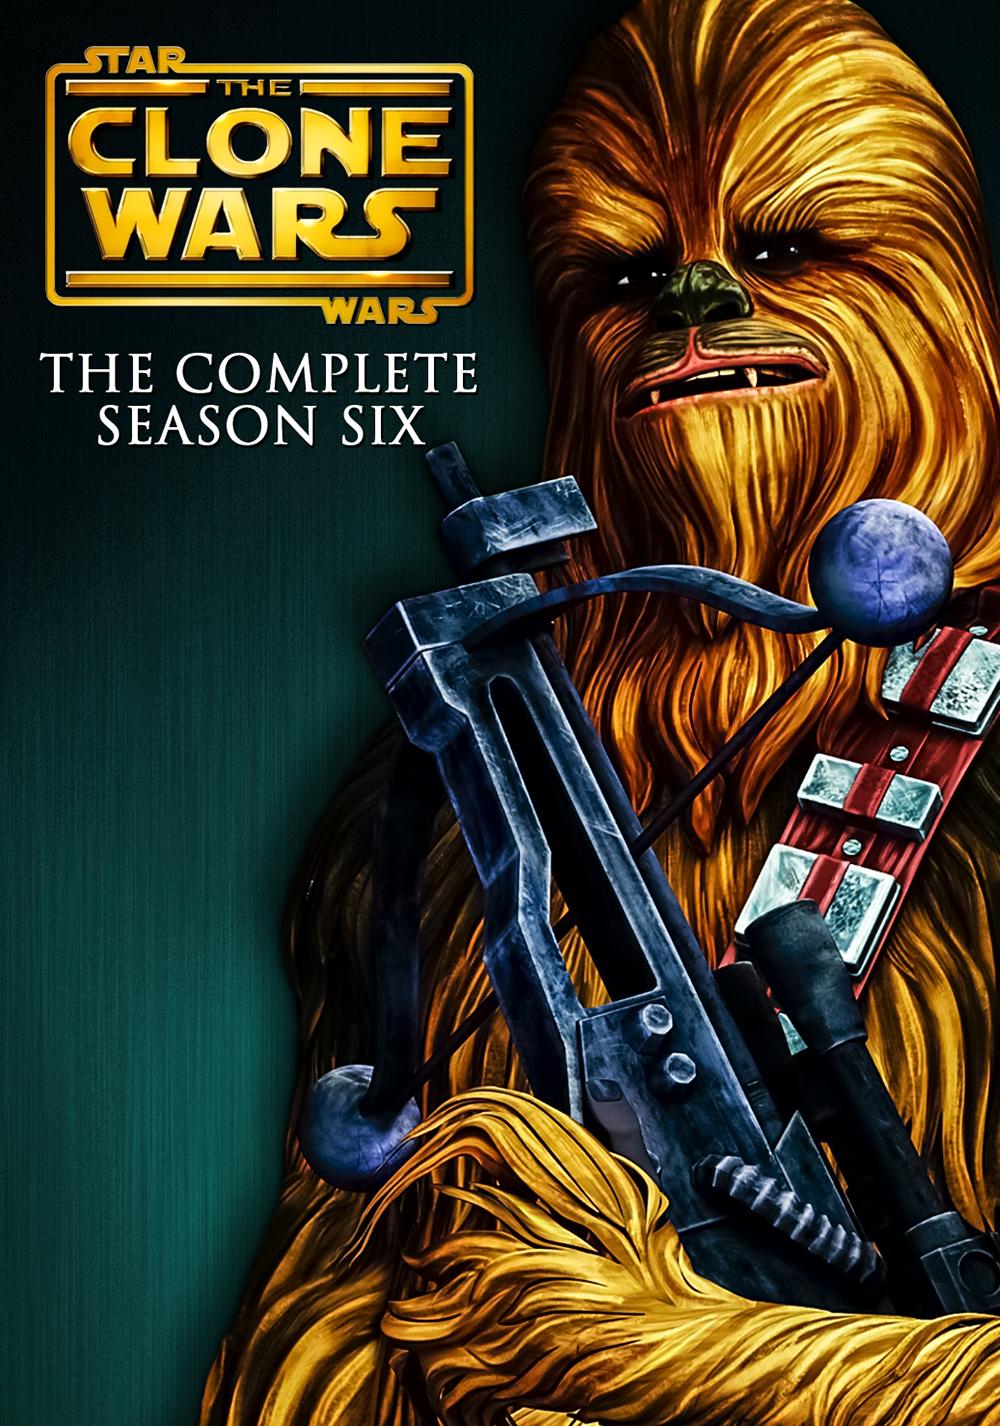 Star Wars The Clone Wars Dvd Cover Star Wars The Clone Wars tv